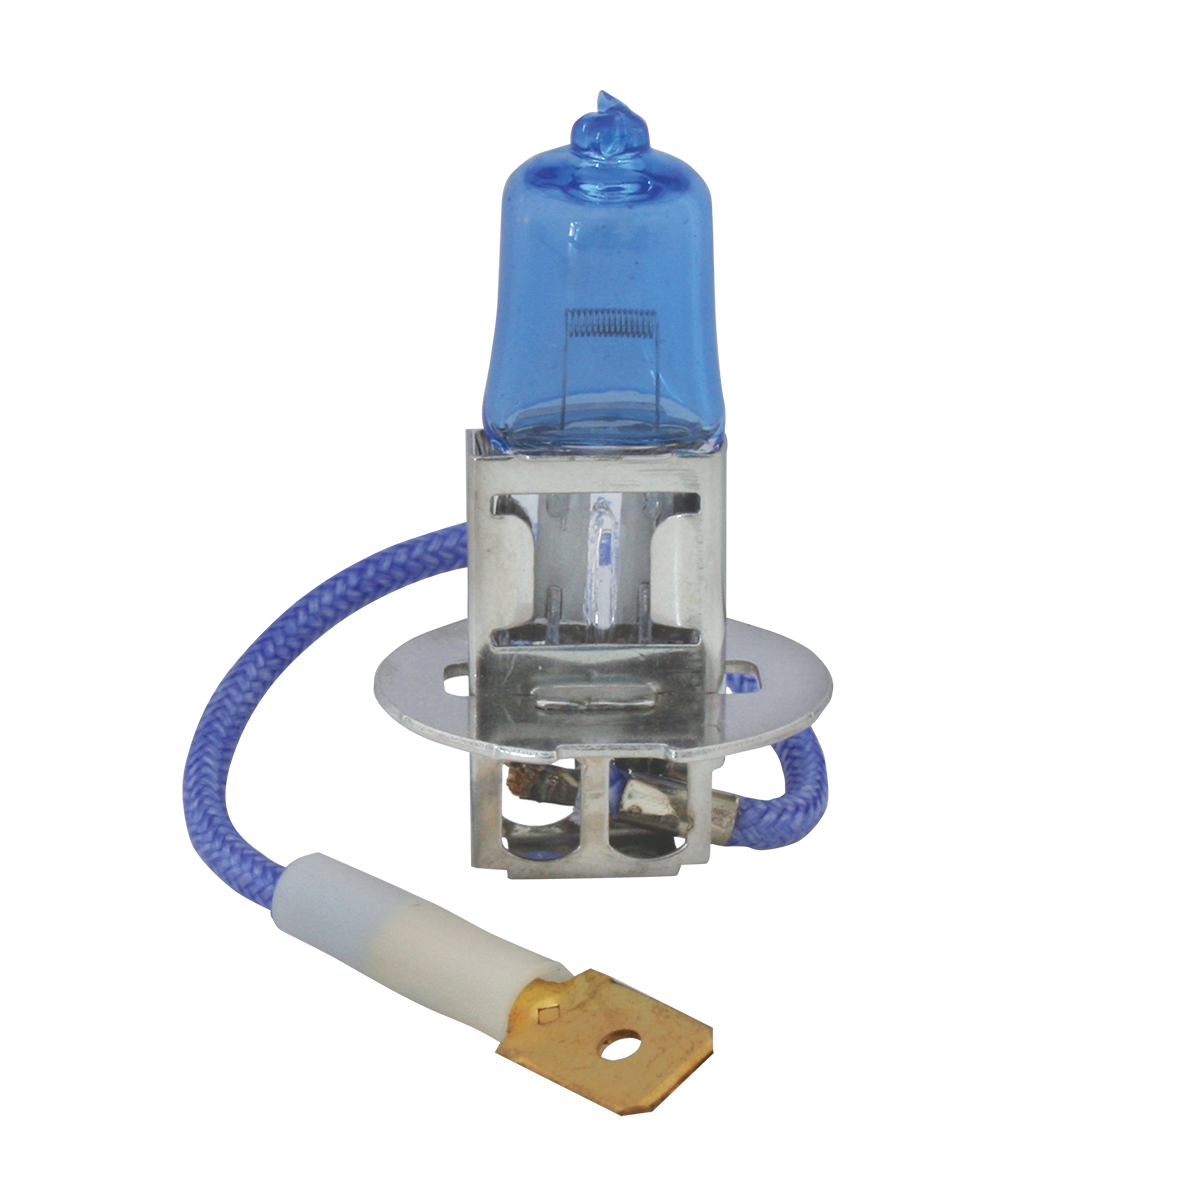 Icy Blue H3 Headlight Halogen Bulb